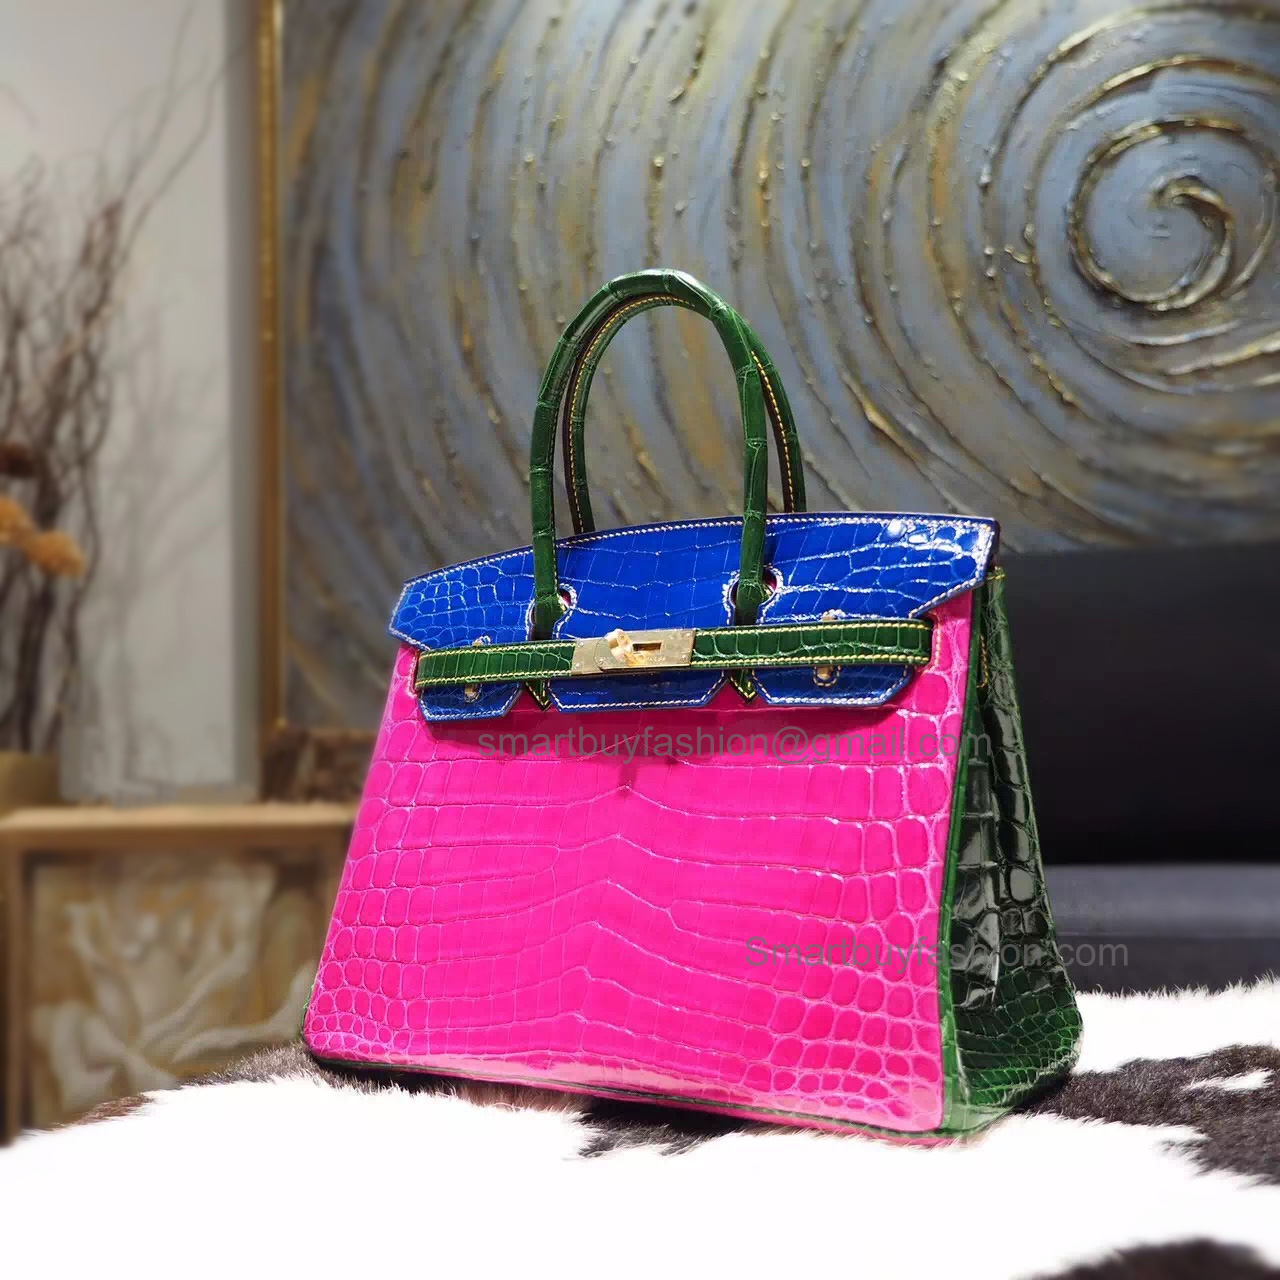 91eacd5b7772 Hand Stitched Birkin 30 Bag in Bicolored ck76 Blue Indigo Shining Nile Croc  GHW -